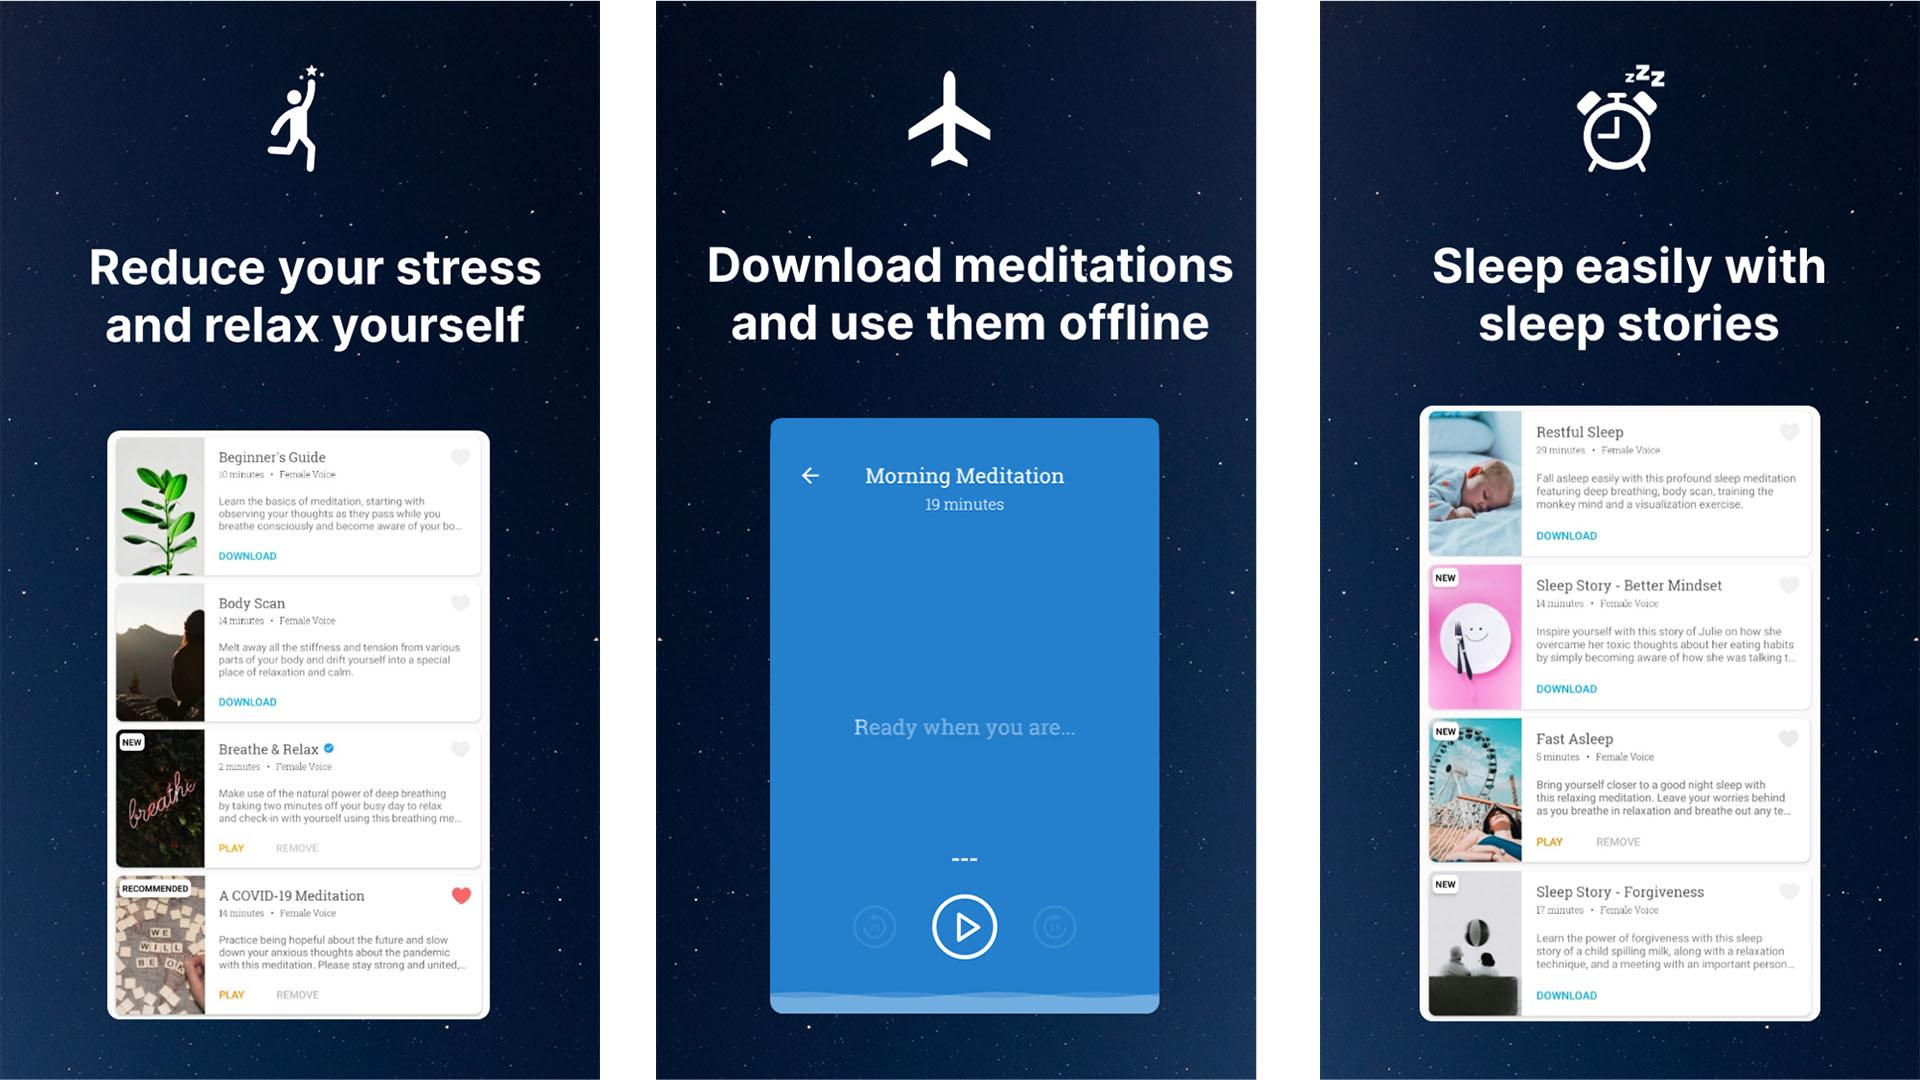 Lets Meditate screenshot 2021